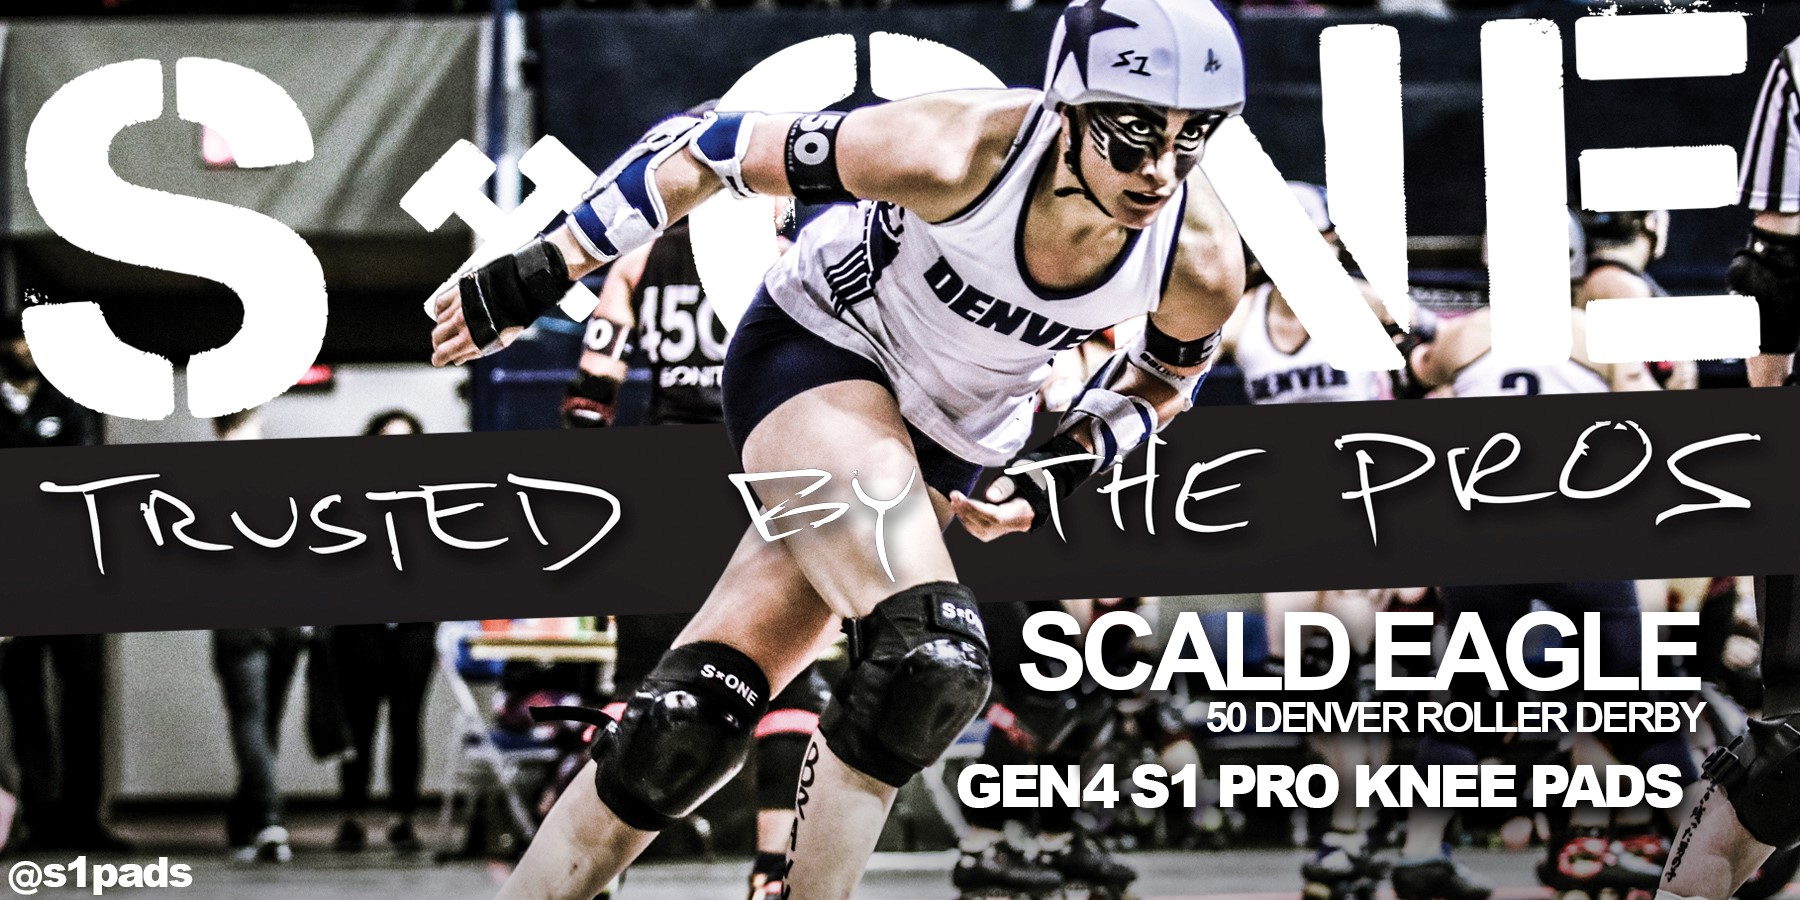 s1-helmet-co-scald-eagle-gen-4-knee-pad-roller-derby-pads.jpg